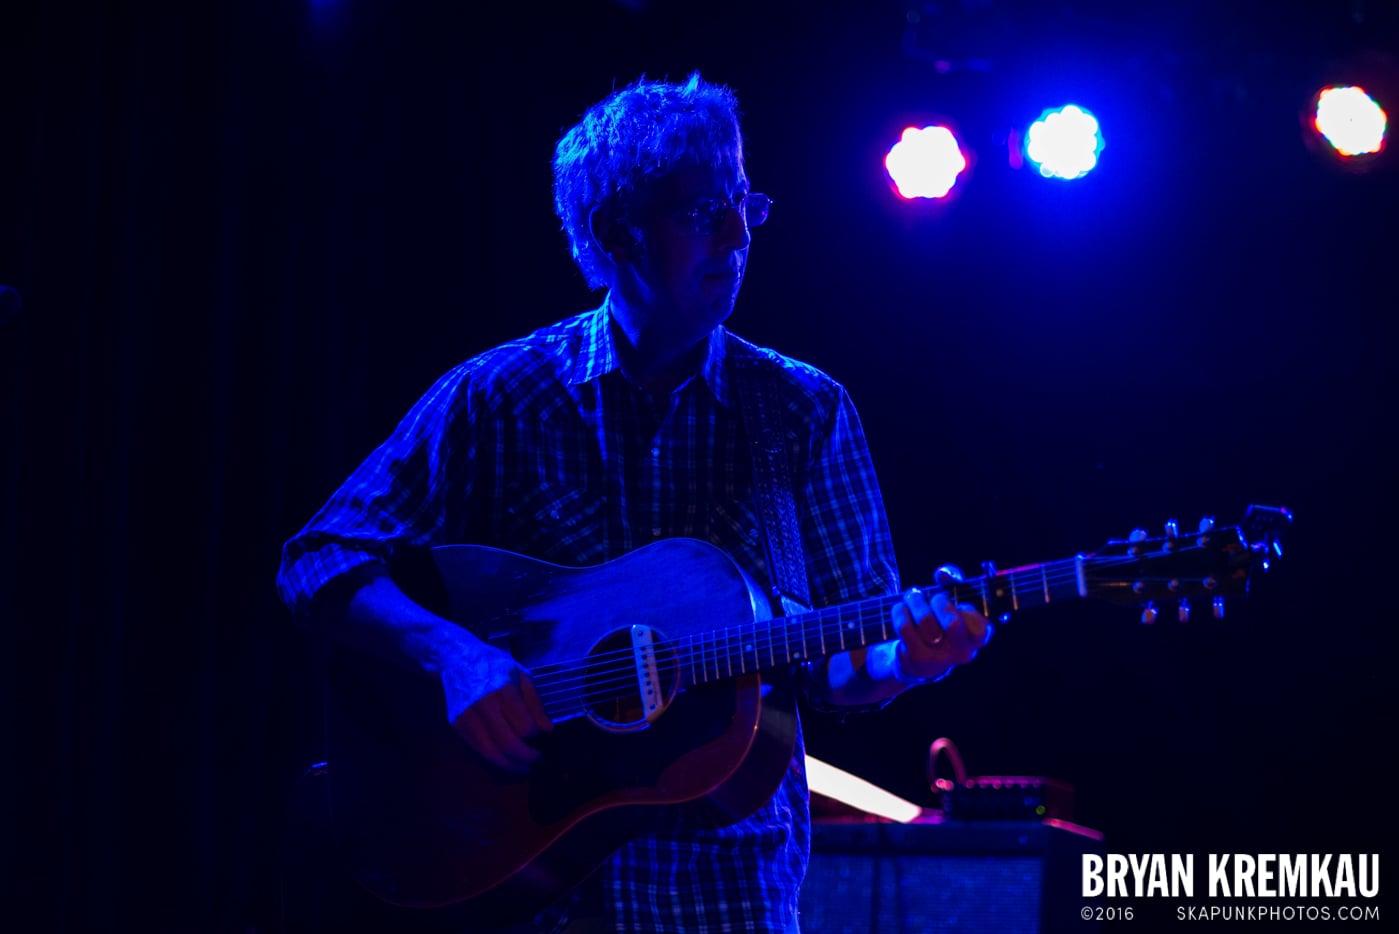 Danny Burns Band @ Knitting Factory, Brooklyn, NY - 9.10.14 (15)